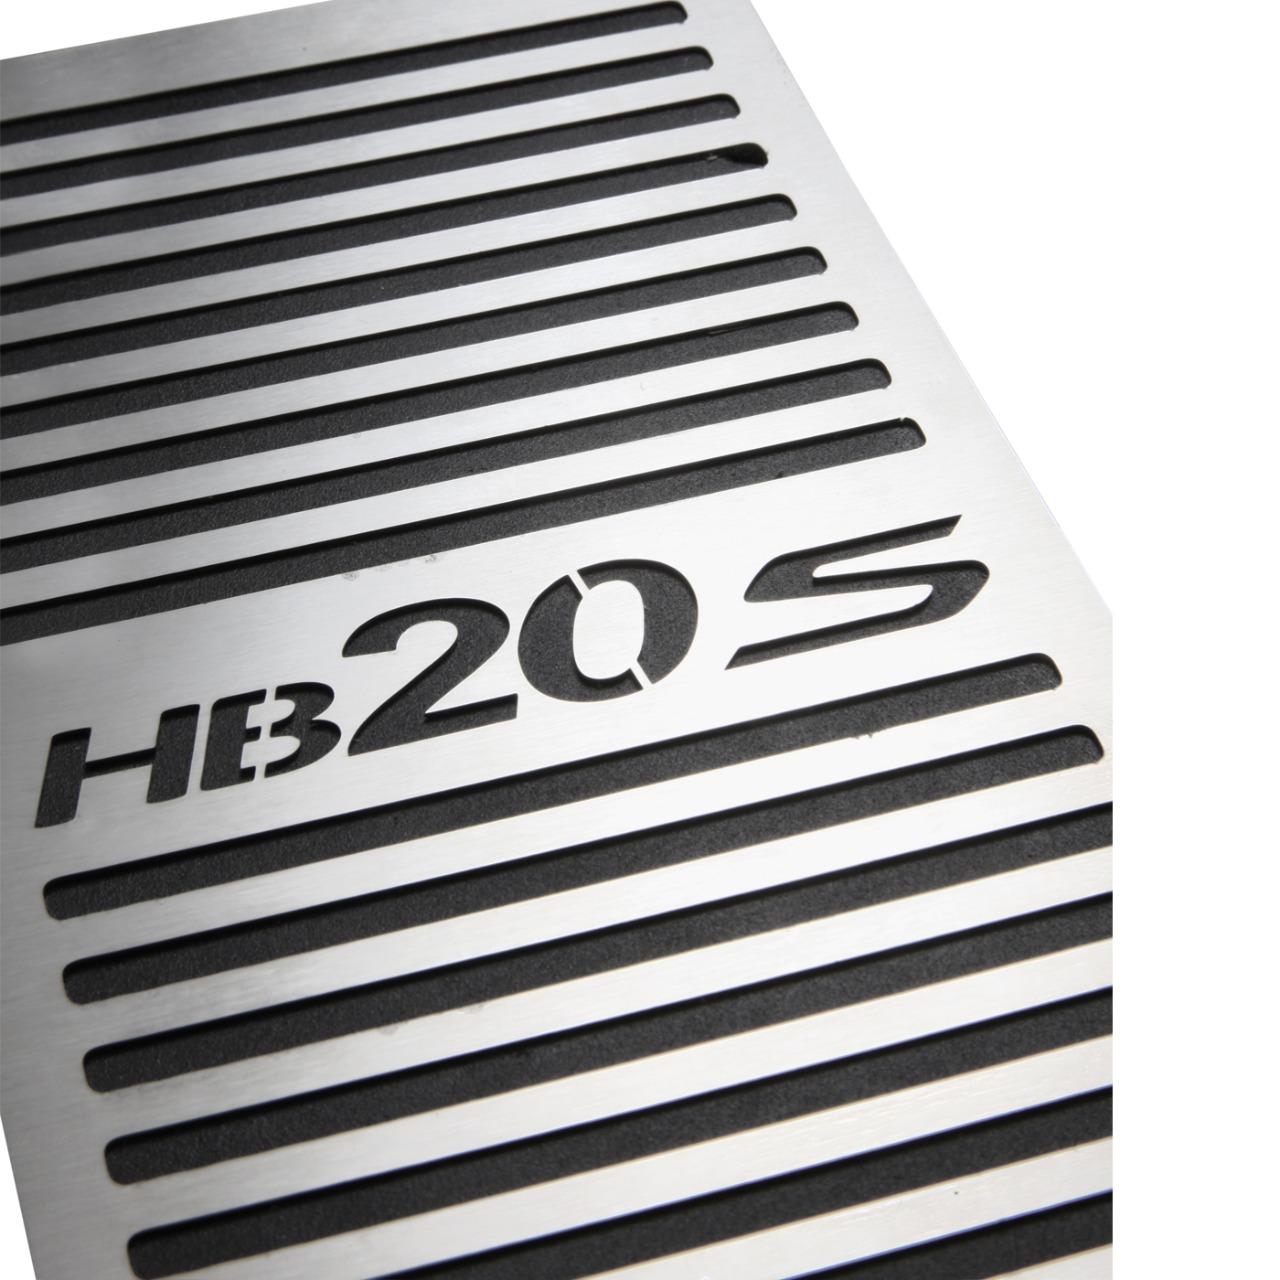 Descanso de Pé Hyundai Hb20S Aço Inox Escovado